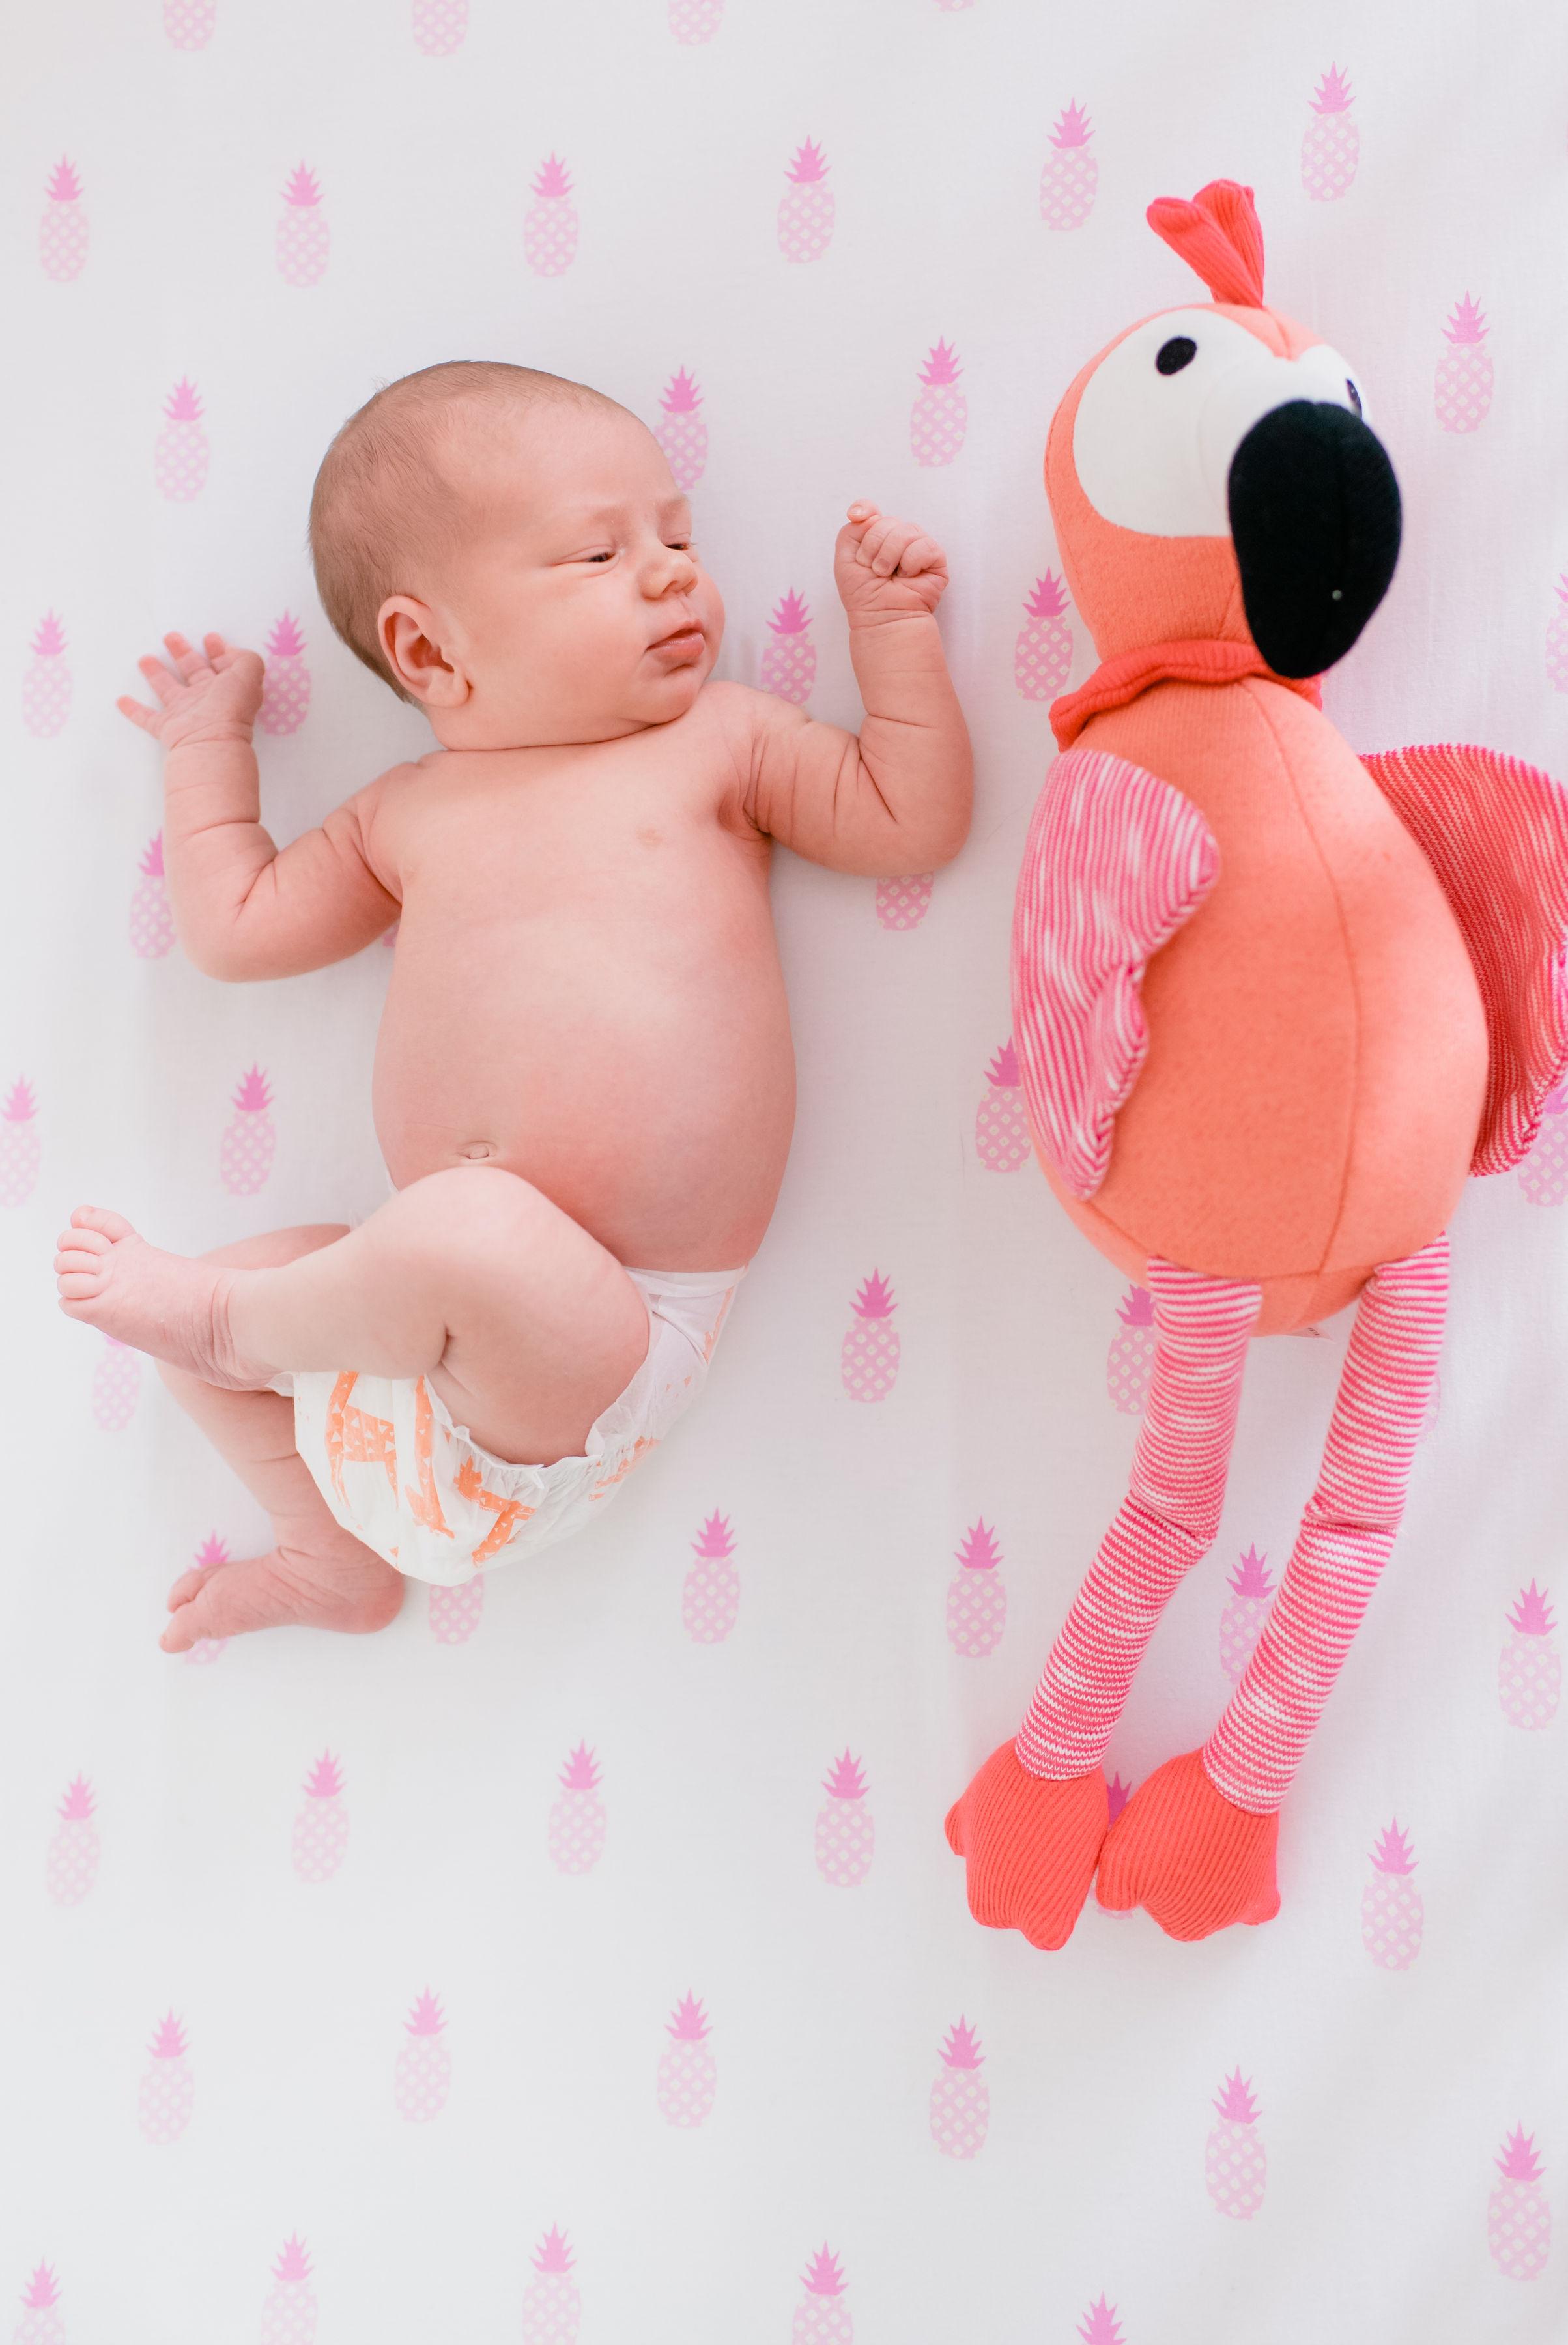 Charlotte_newborn-4.jpg